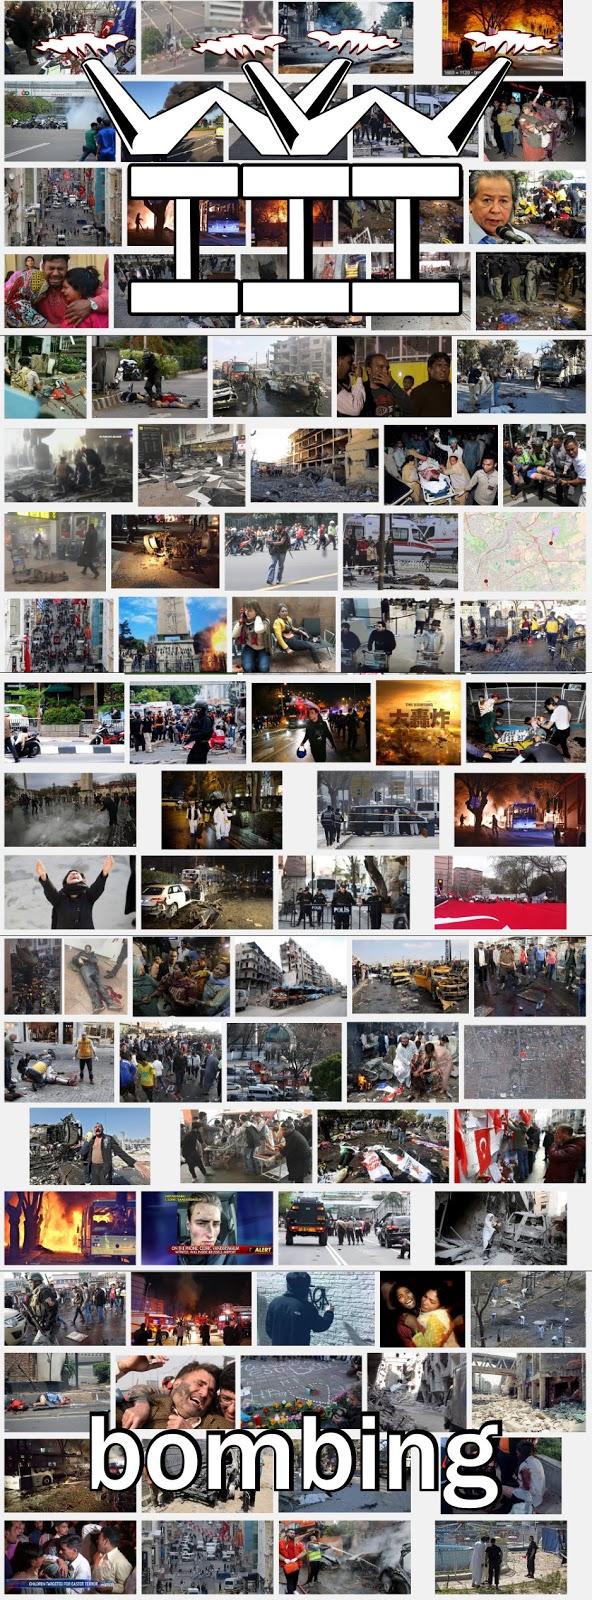 https://www.google.com/search?q=bombing+2016&safe=off&source=lnms&tbm=isch&sa=X&ved=0ahUKEwivroHEpvjNAhVS2mMKHYXHAzQQ_AUICigD&biw=1366&bih=643#imgrc=_